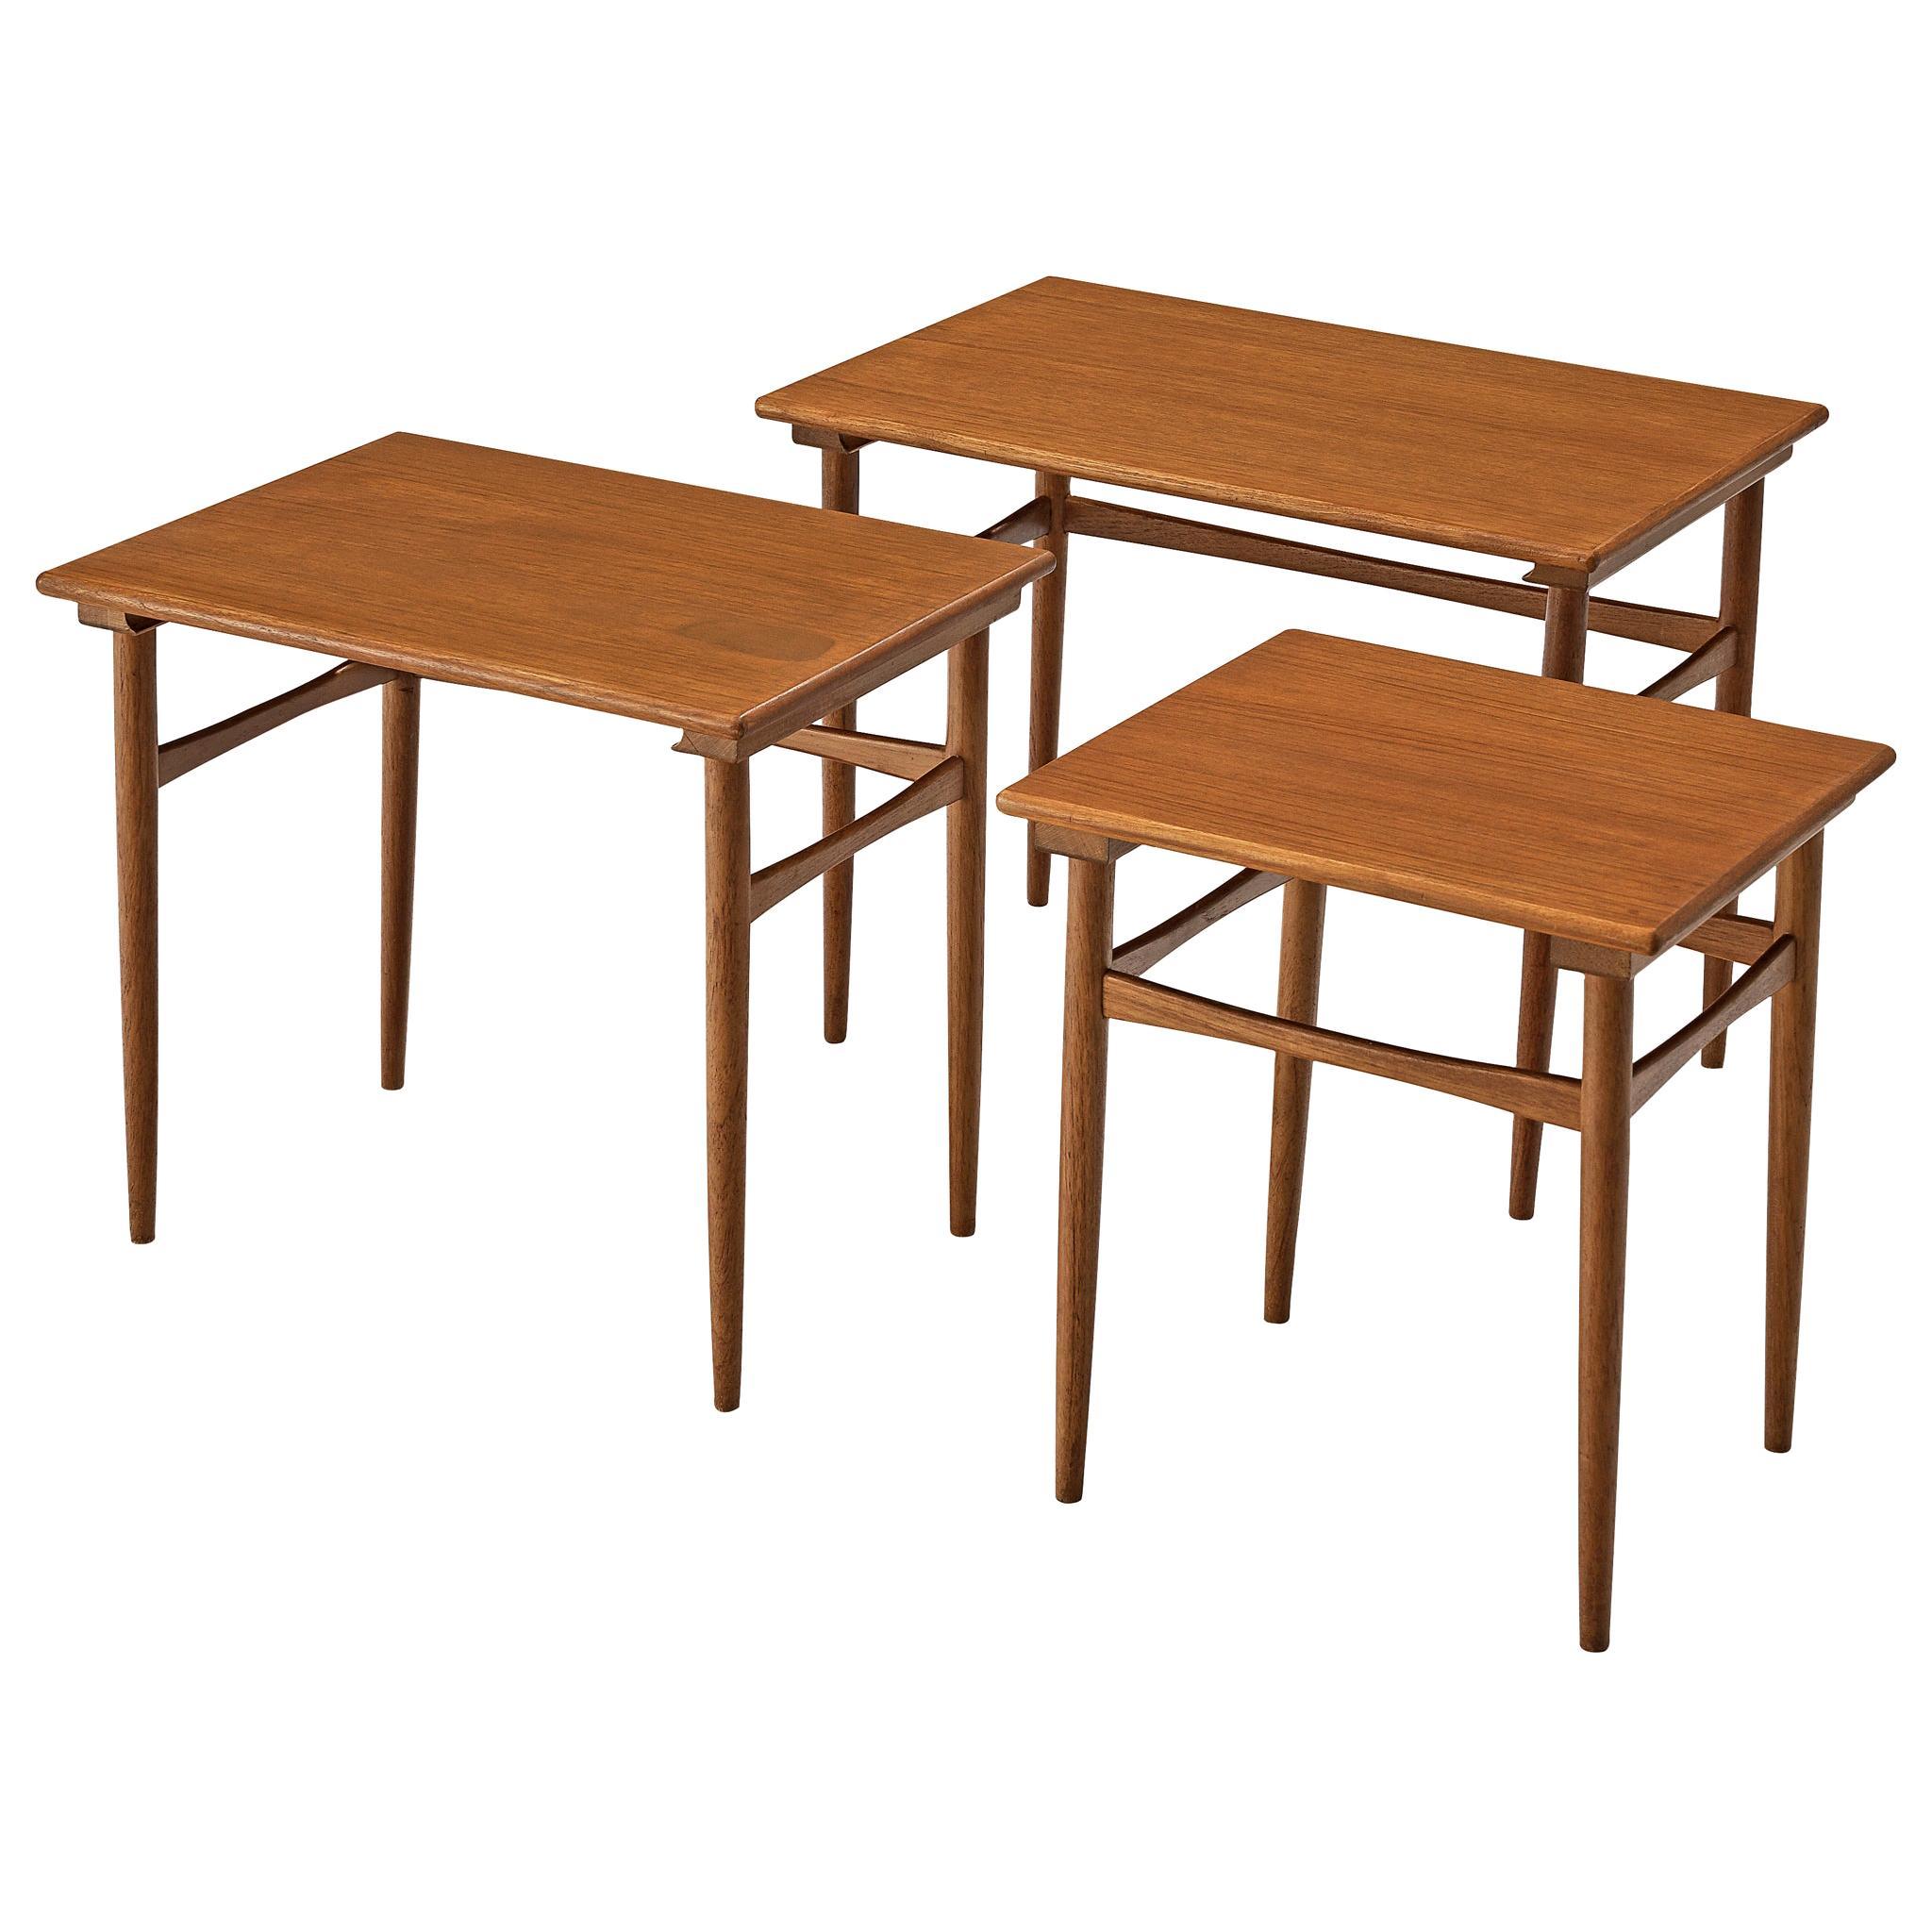 Set of Three Danish Nesting Tables in Teak